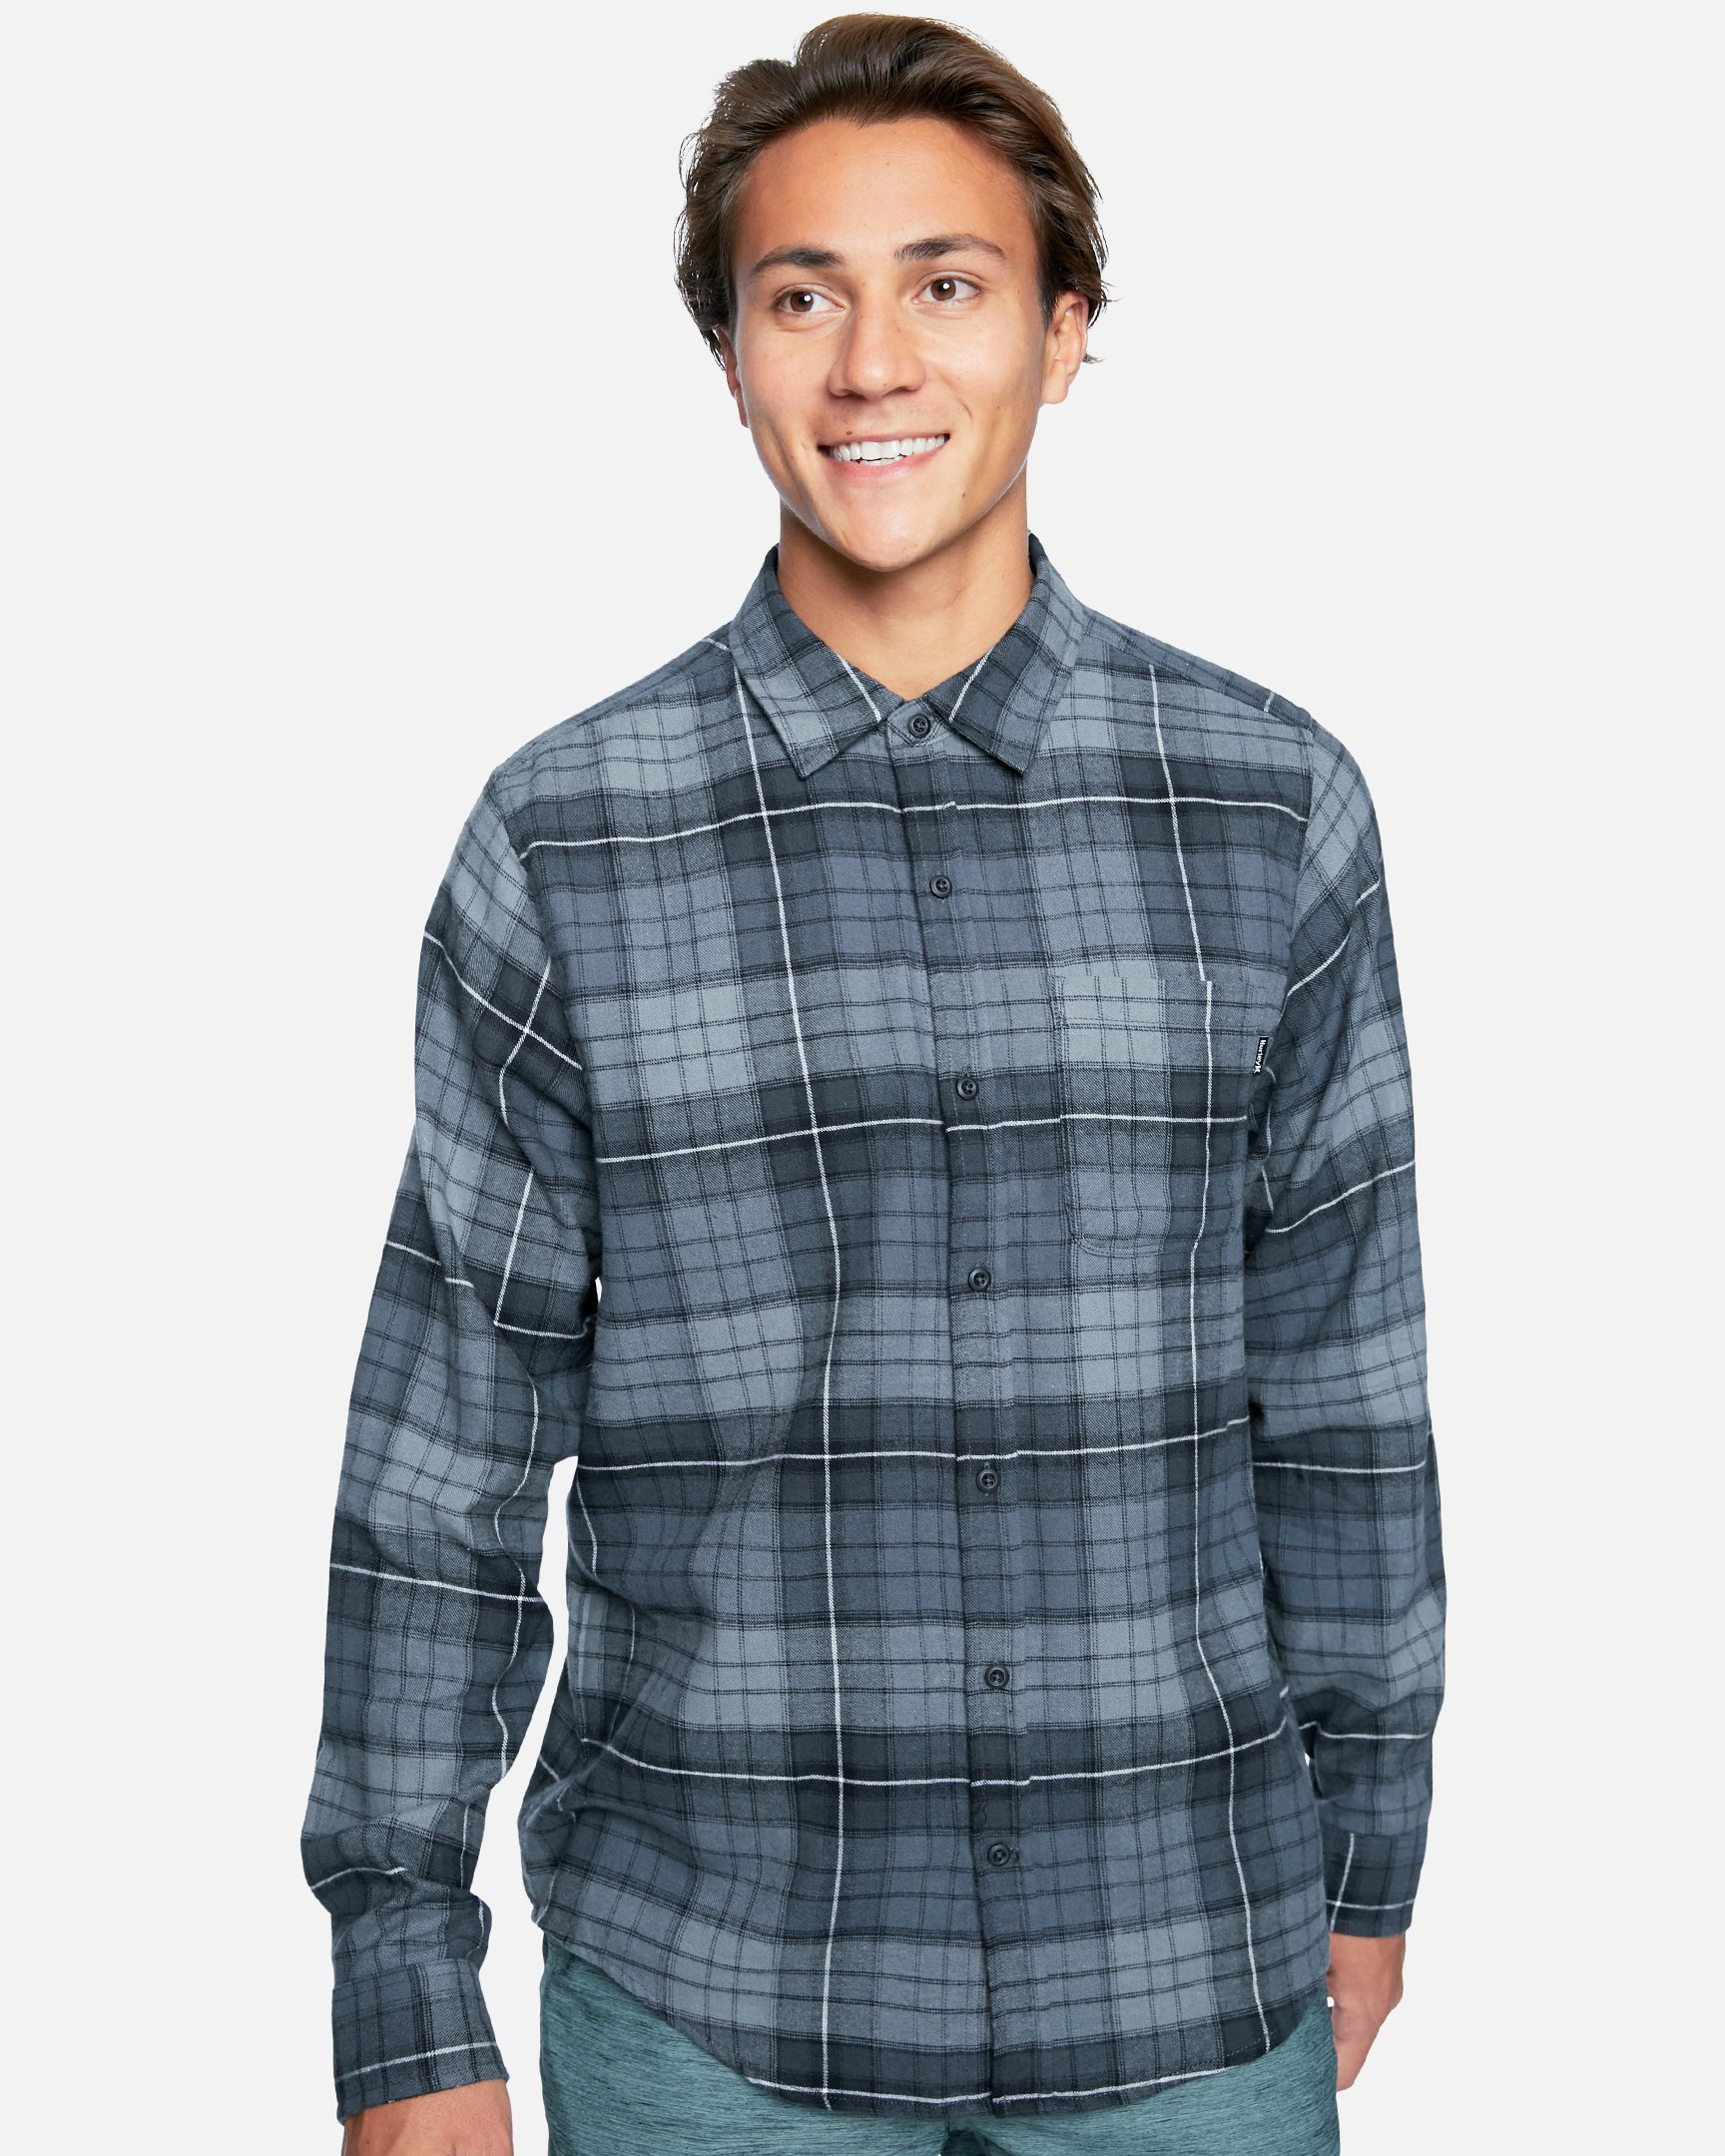 Mens Portland Flannel Long Sleeve T-Shirt in Dk Smoke Grey, Size Medium